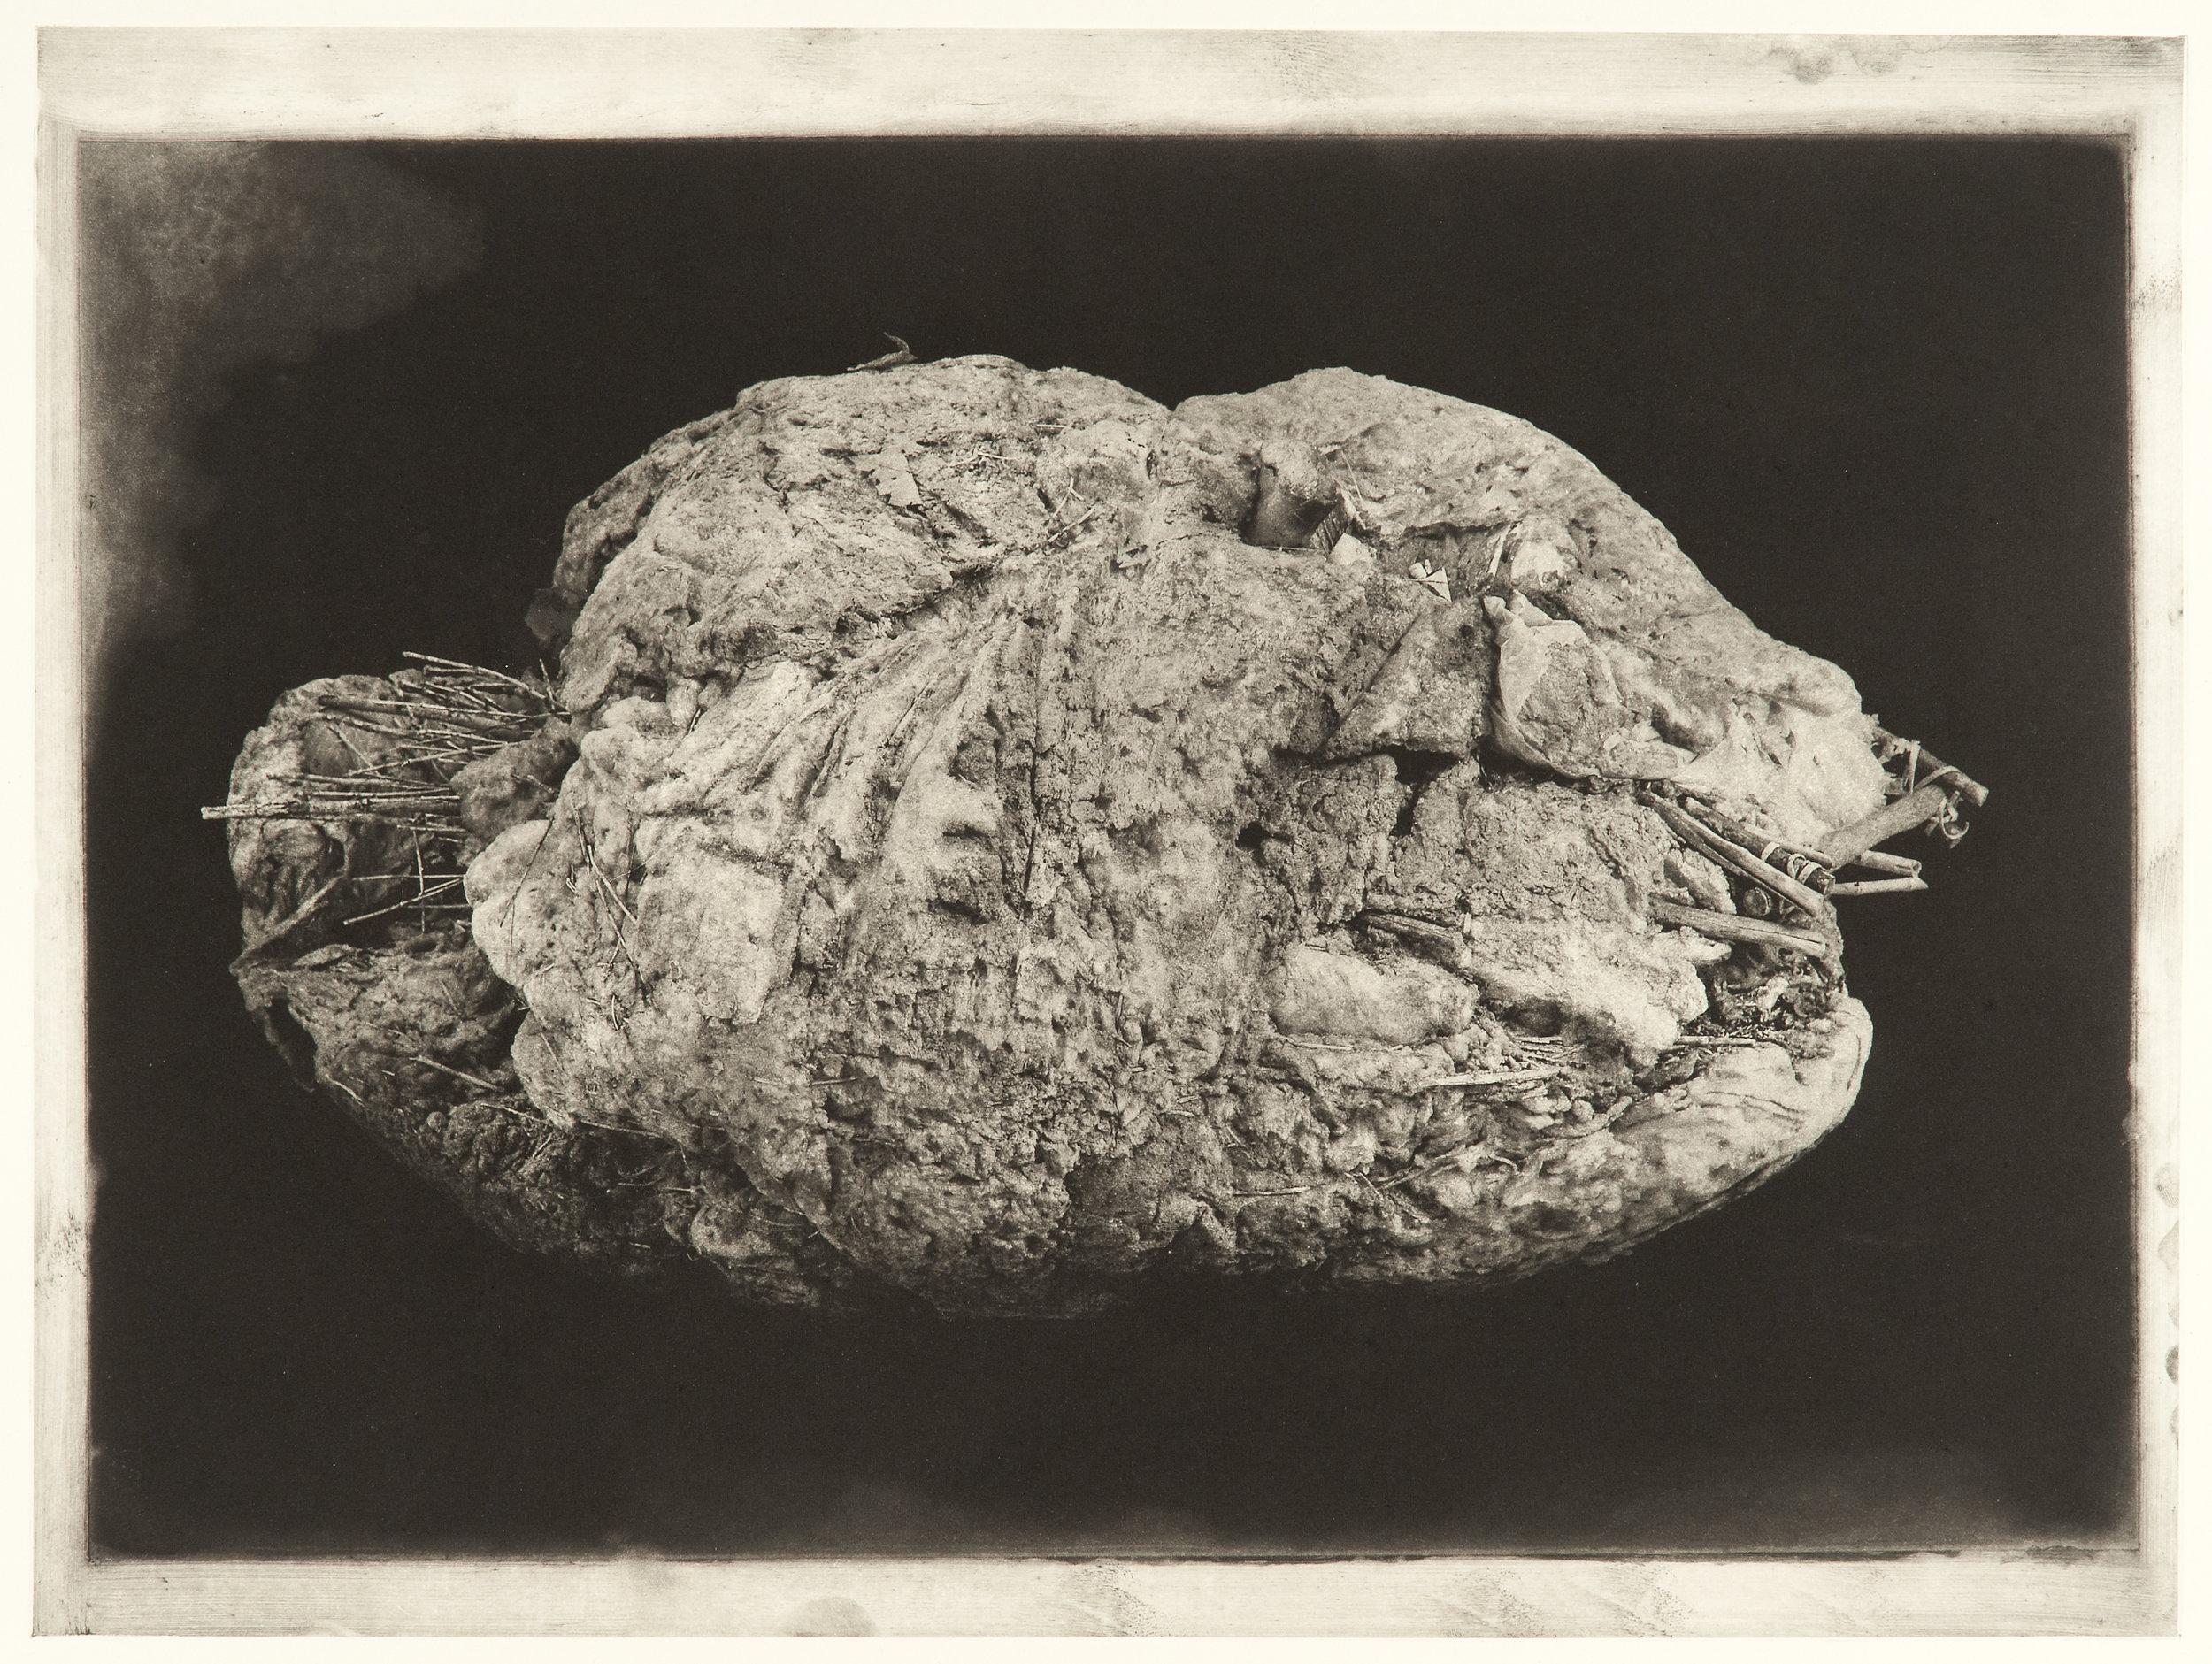 """Degeneration # 4489"", 22"" x 30"", photogravure of urethane sculpture weathered"